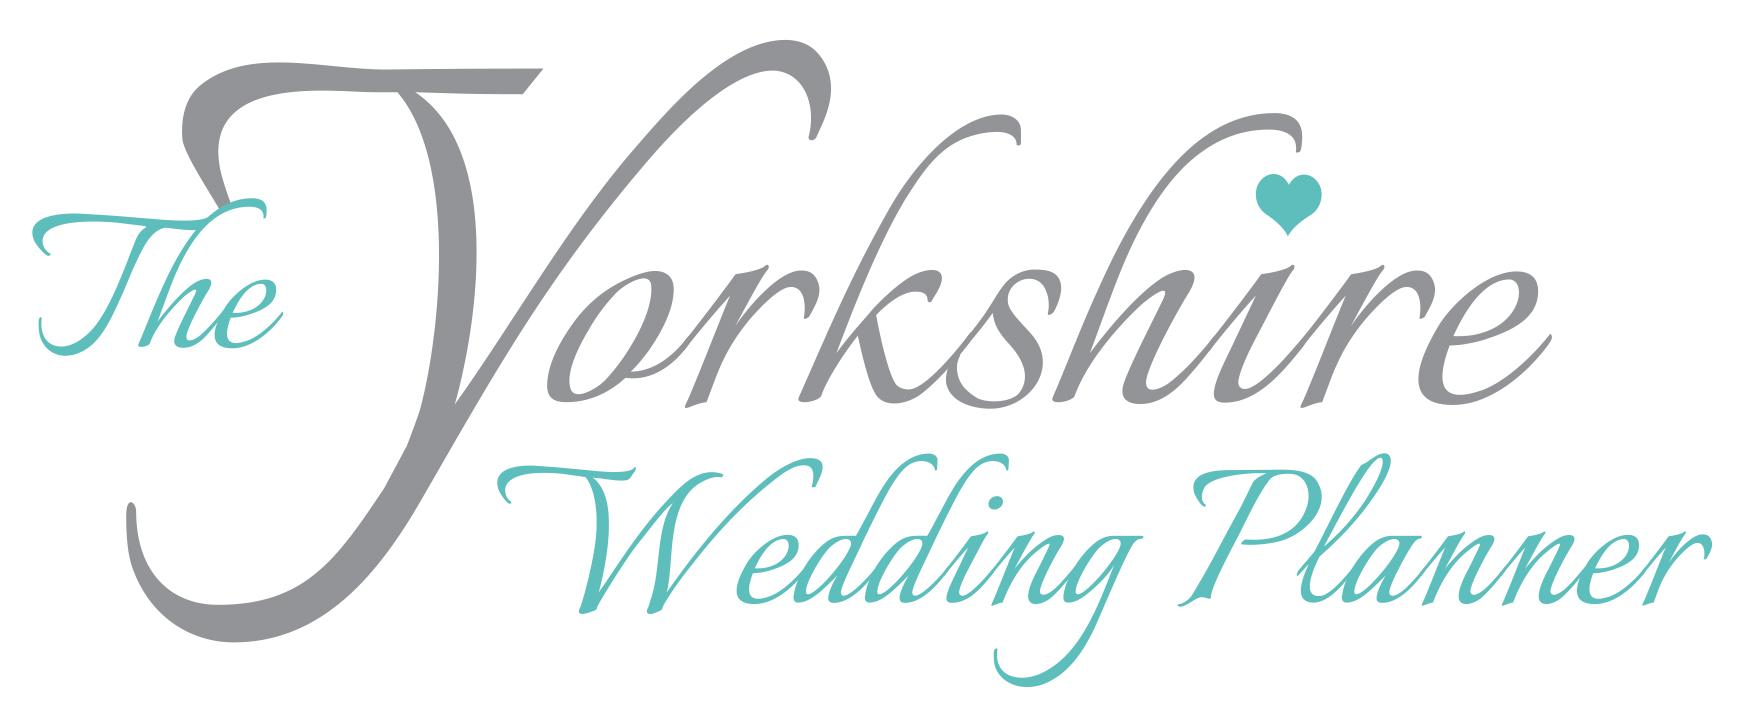 The Yorkshire Wedding Planner